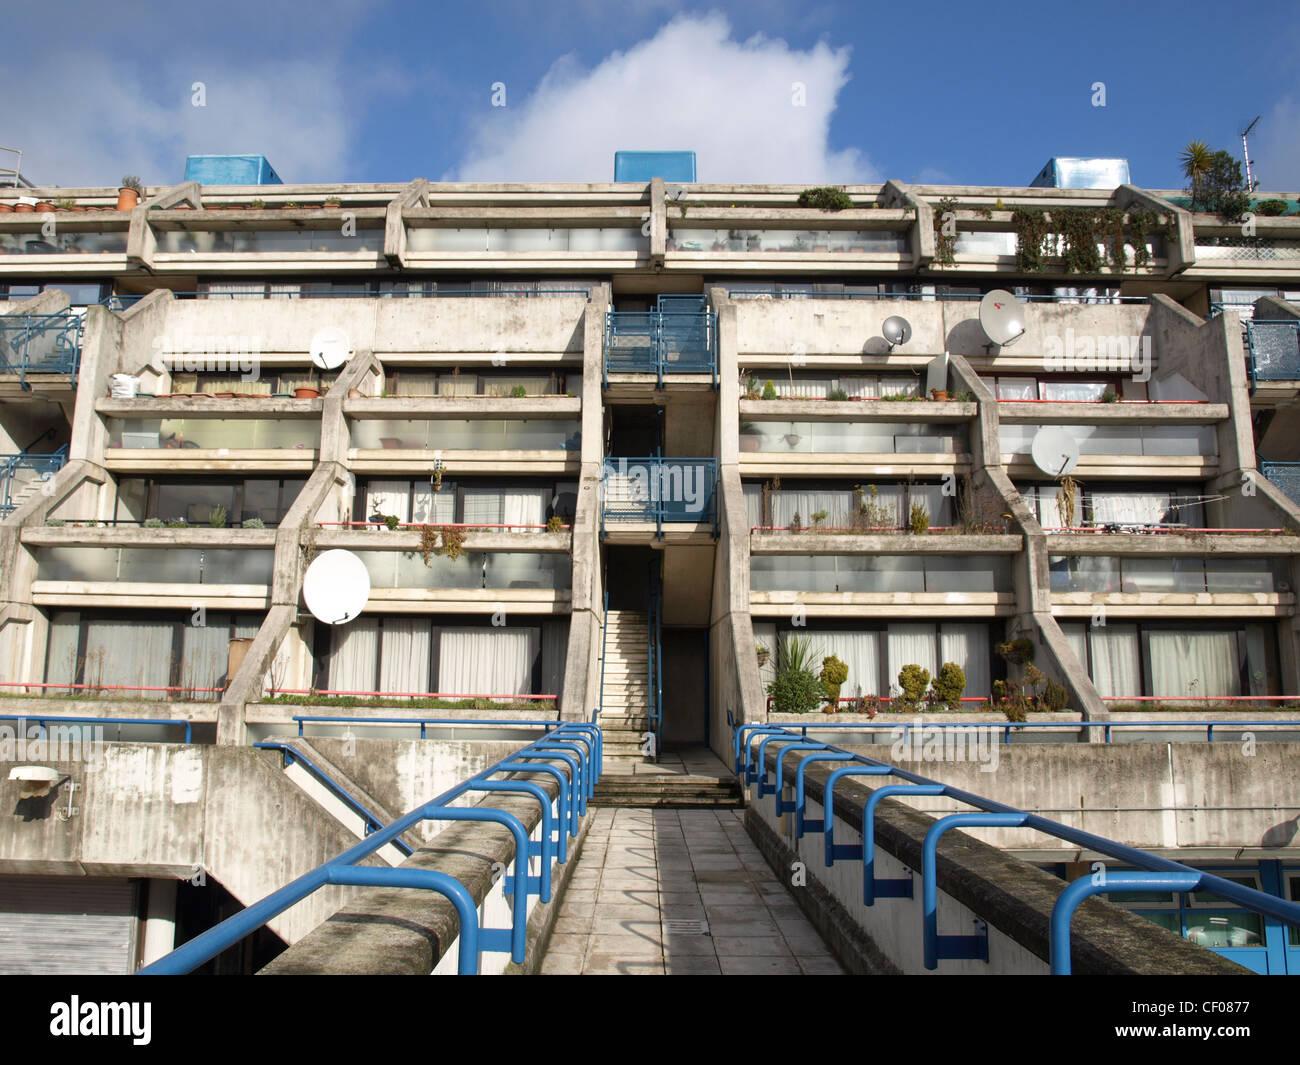 Alexandra Road housing estate iconic new brutalist architecture in London, England, UK Stock Photo